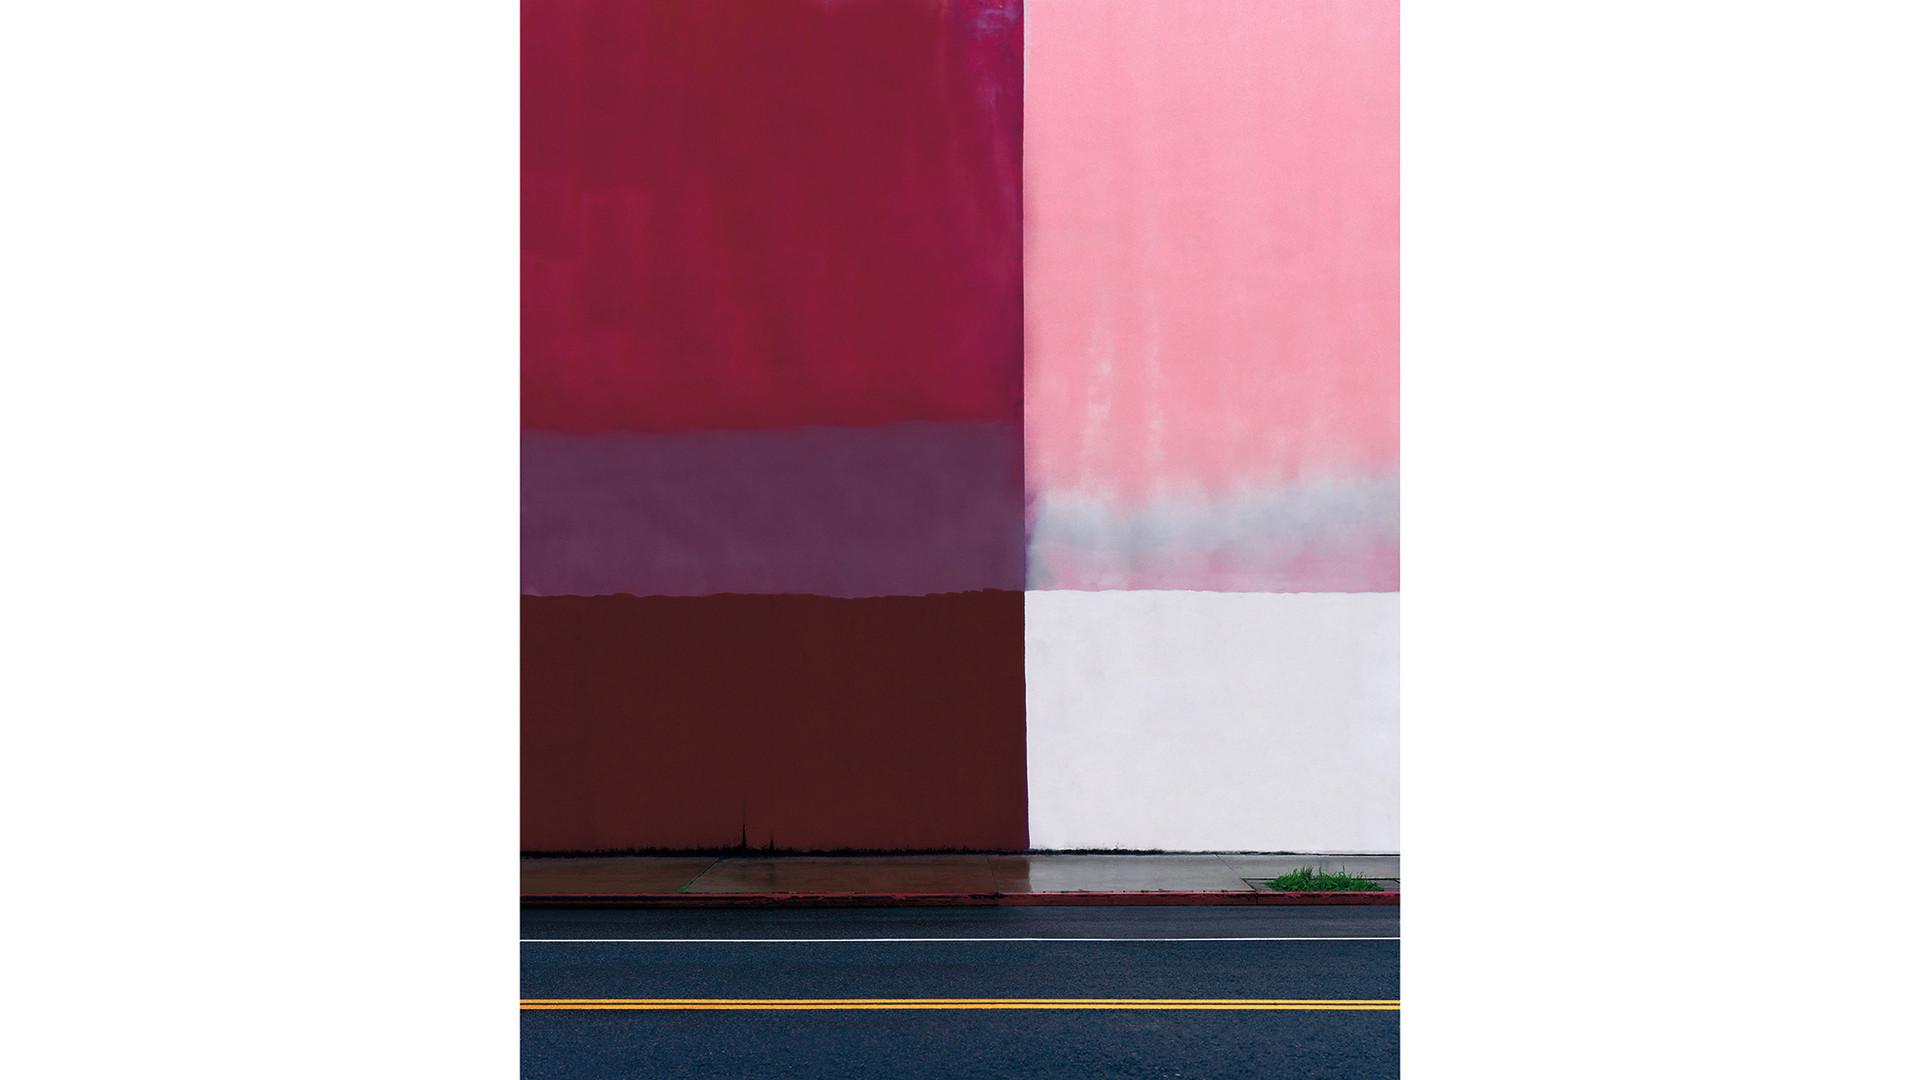 E 6th Street III, 2017 170 x 140 cm, archival pigment print, ed. of 7